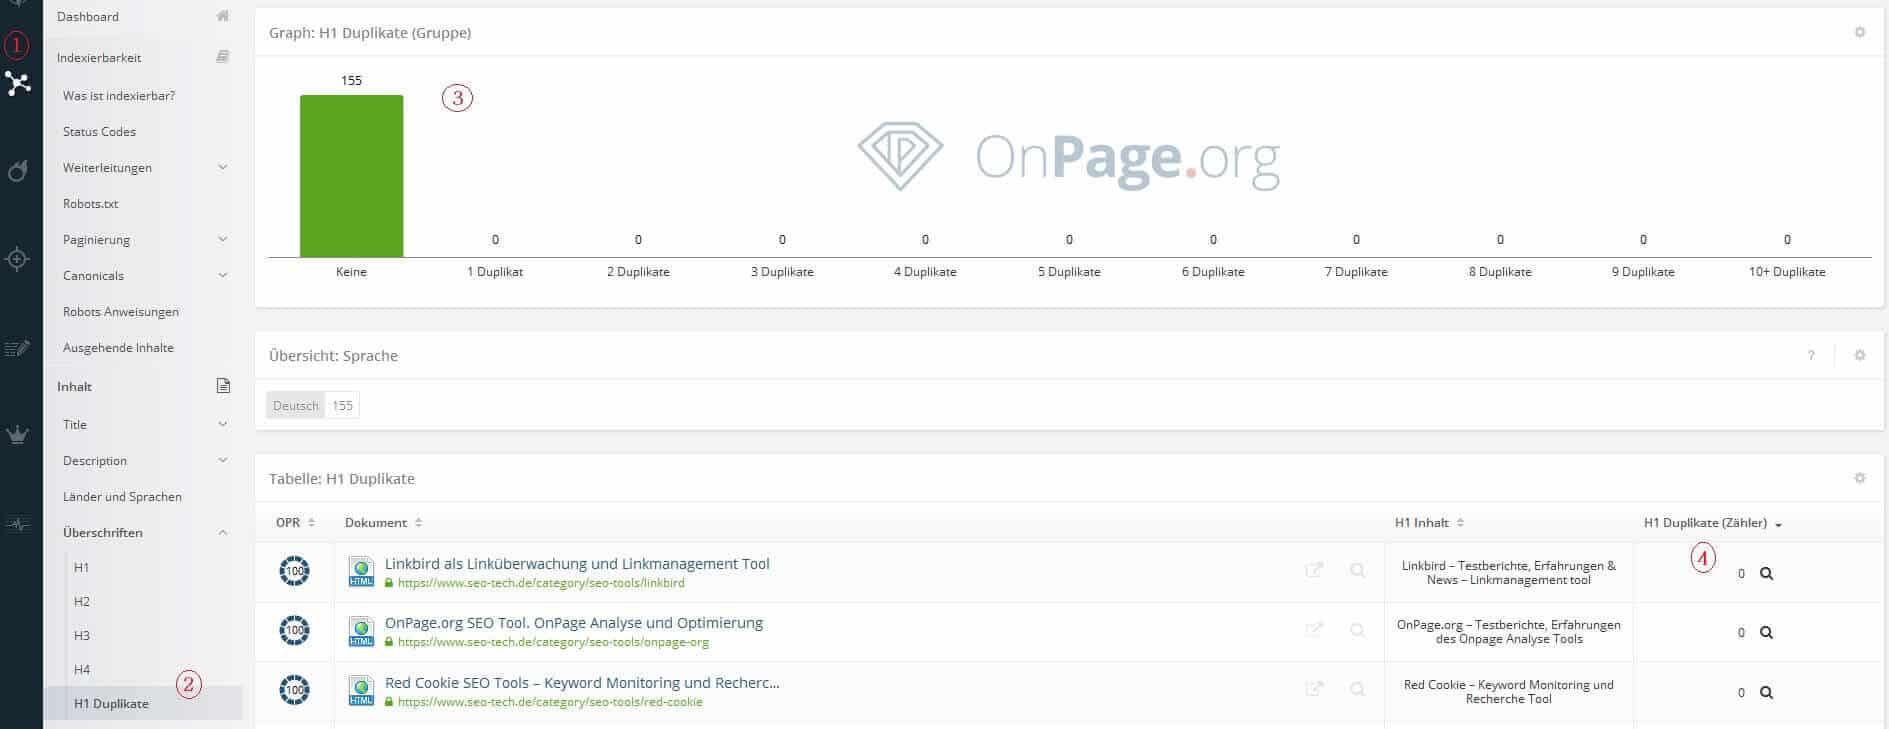 onpage.org H1 Duplikate